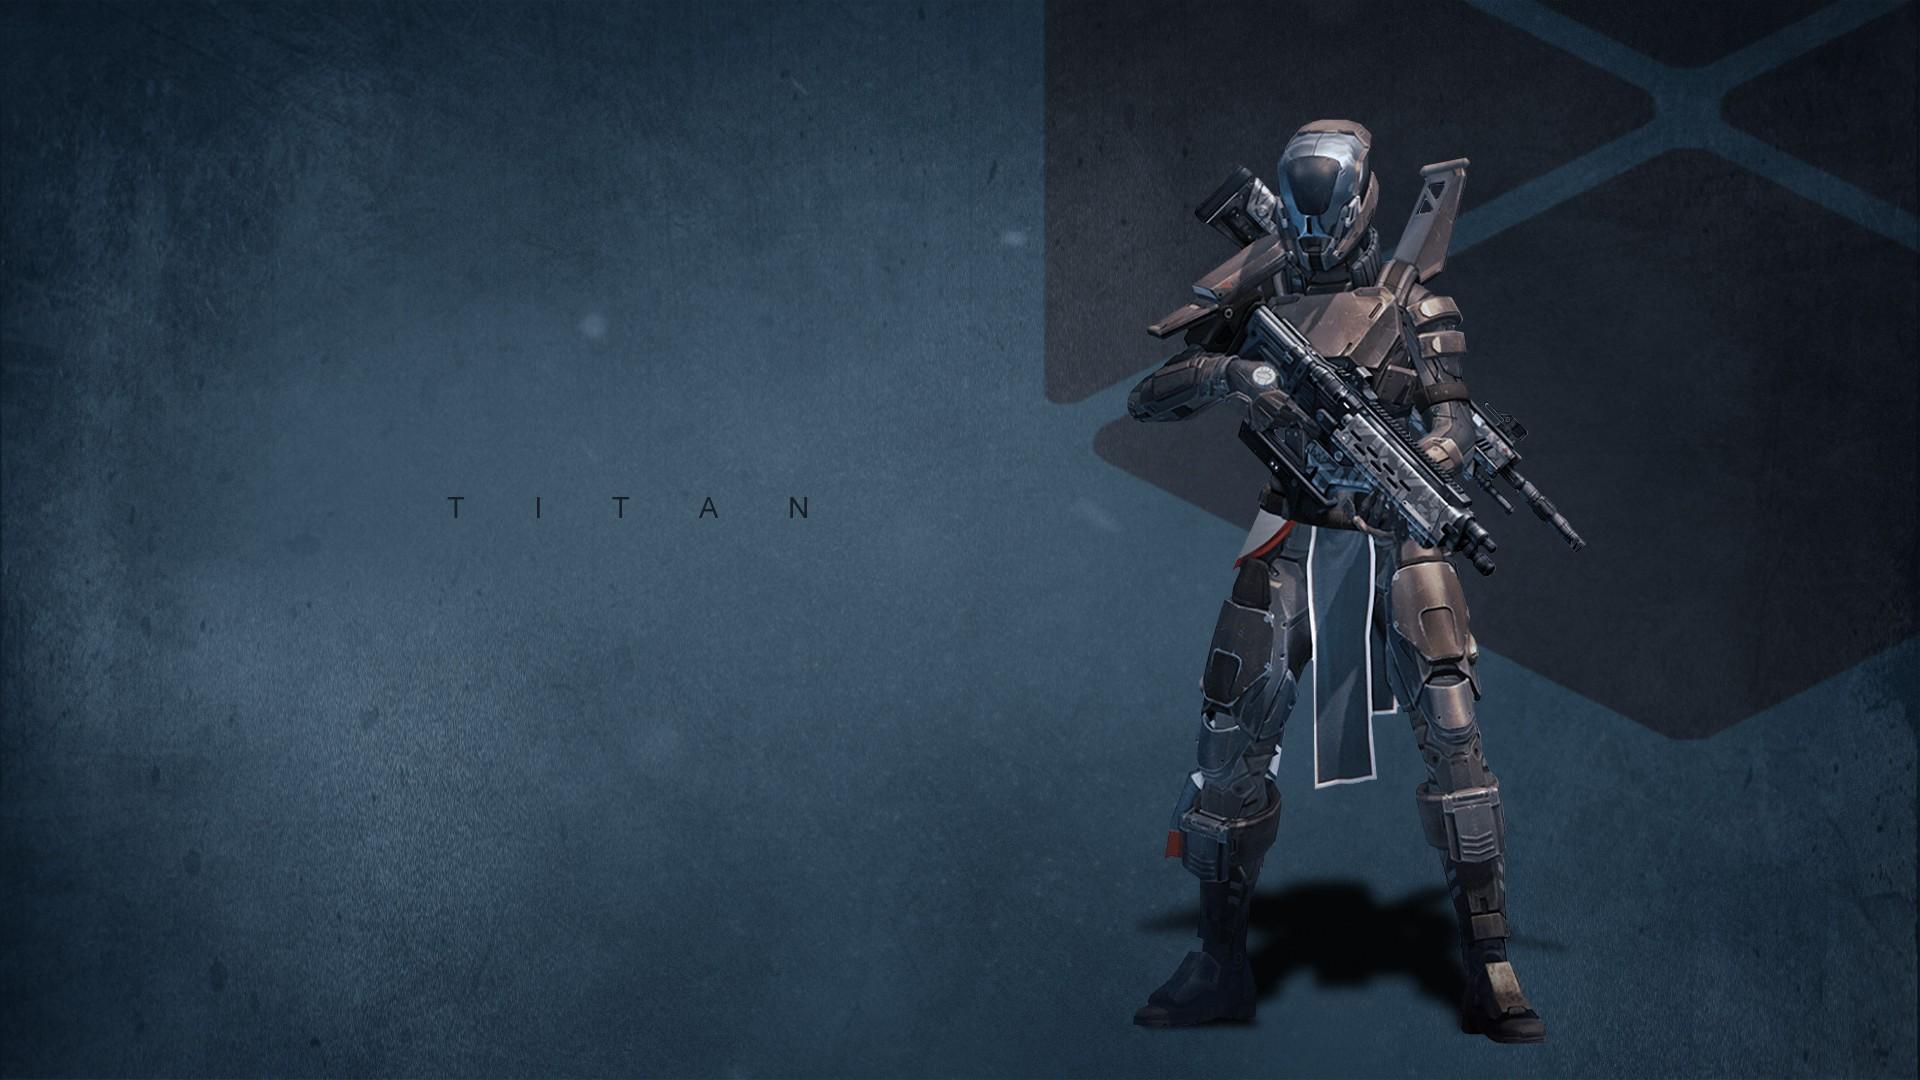 Destiny Titan Wallpaper Download Free Amazing High